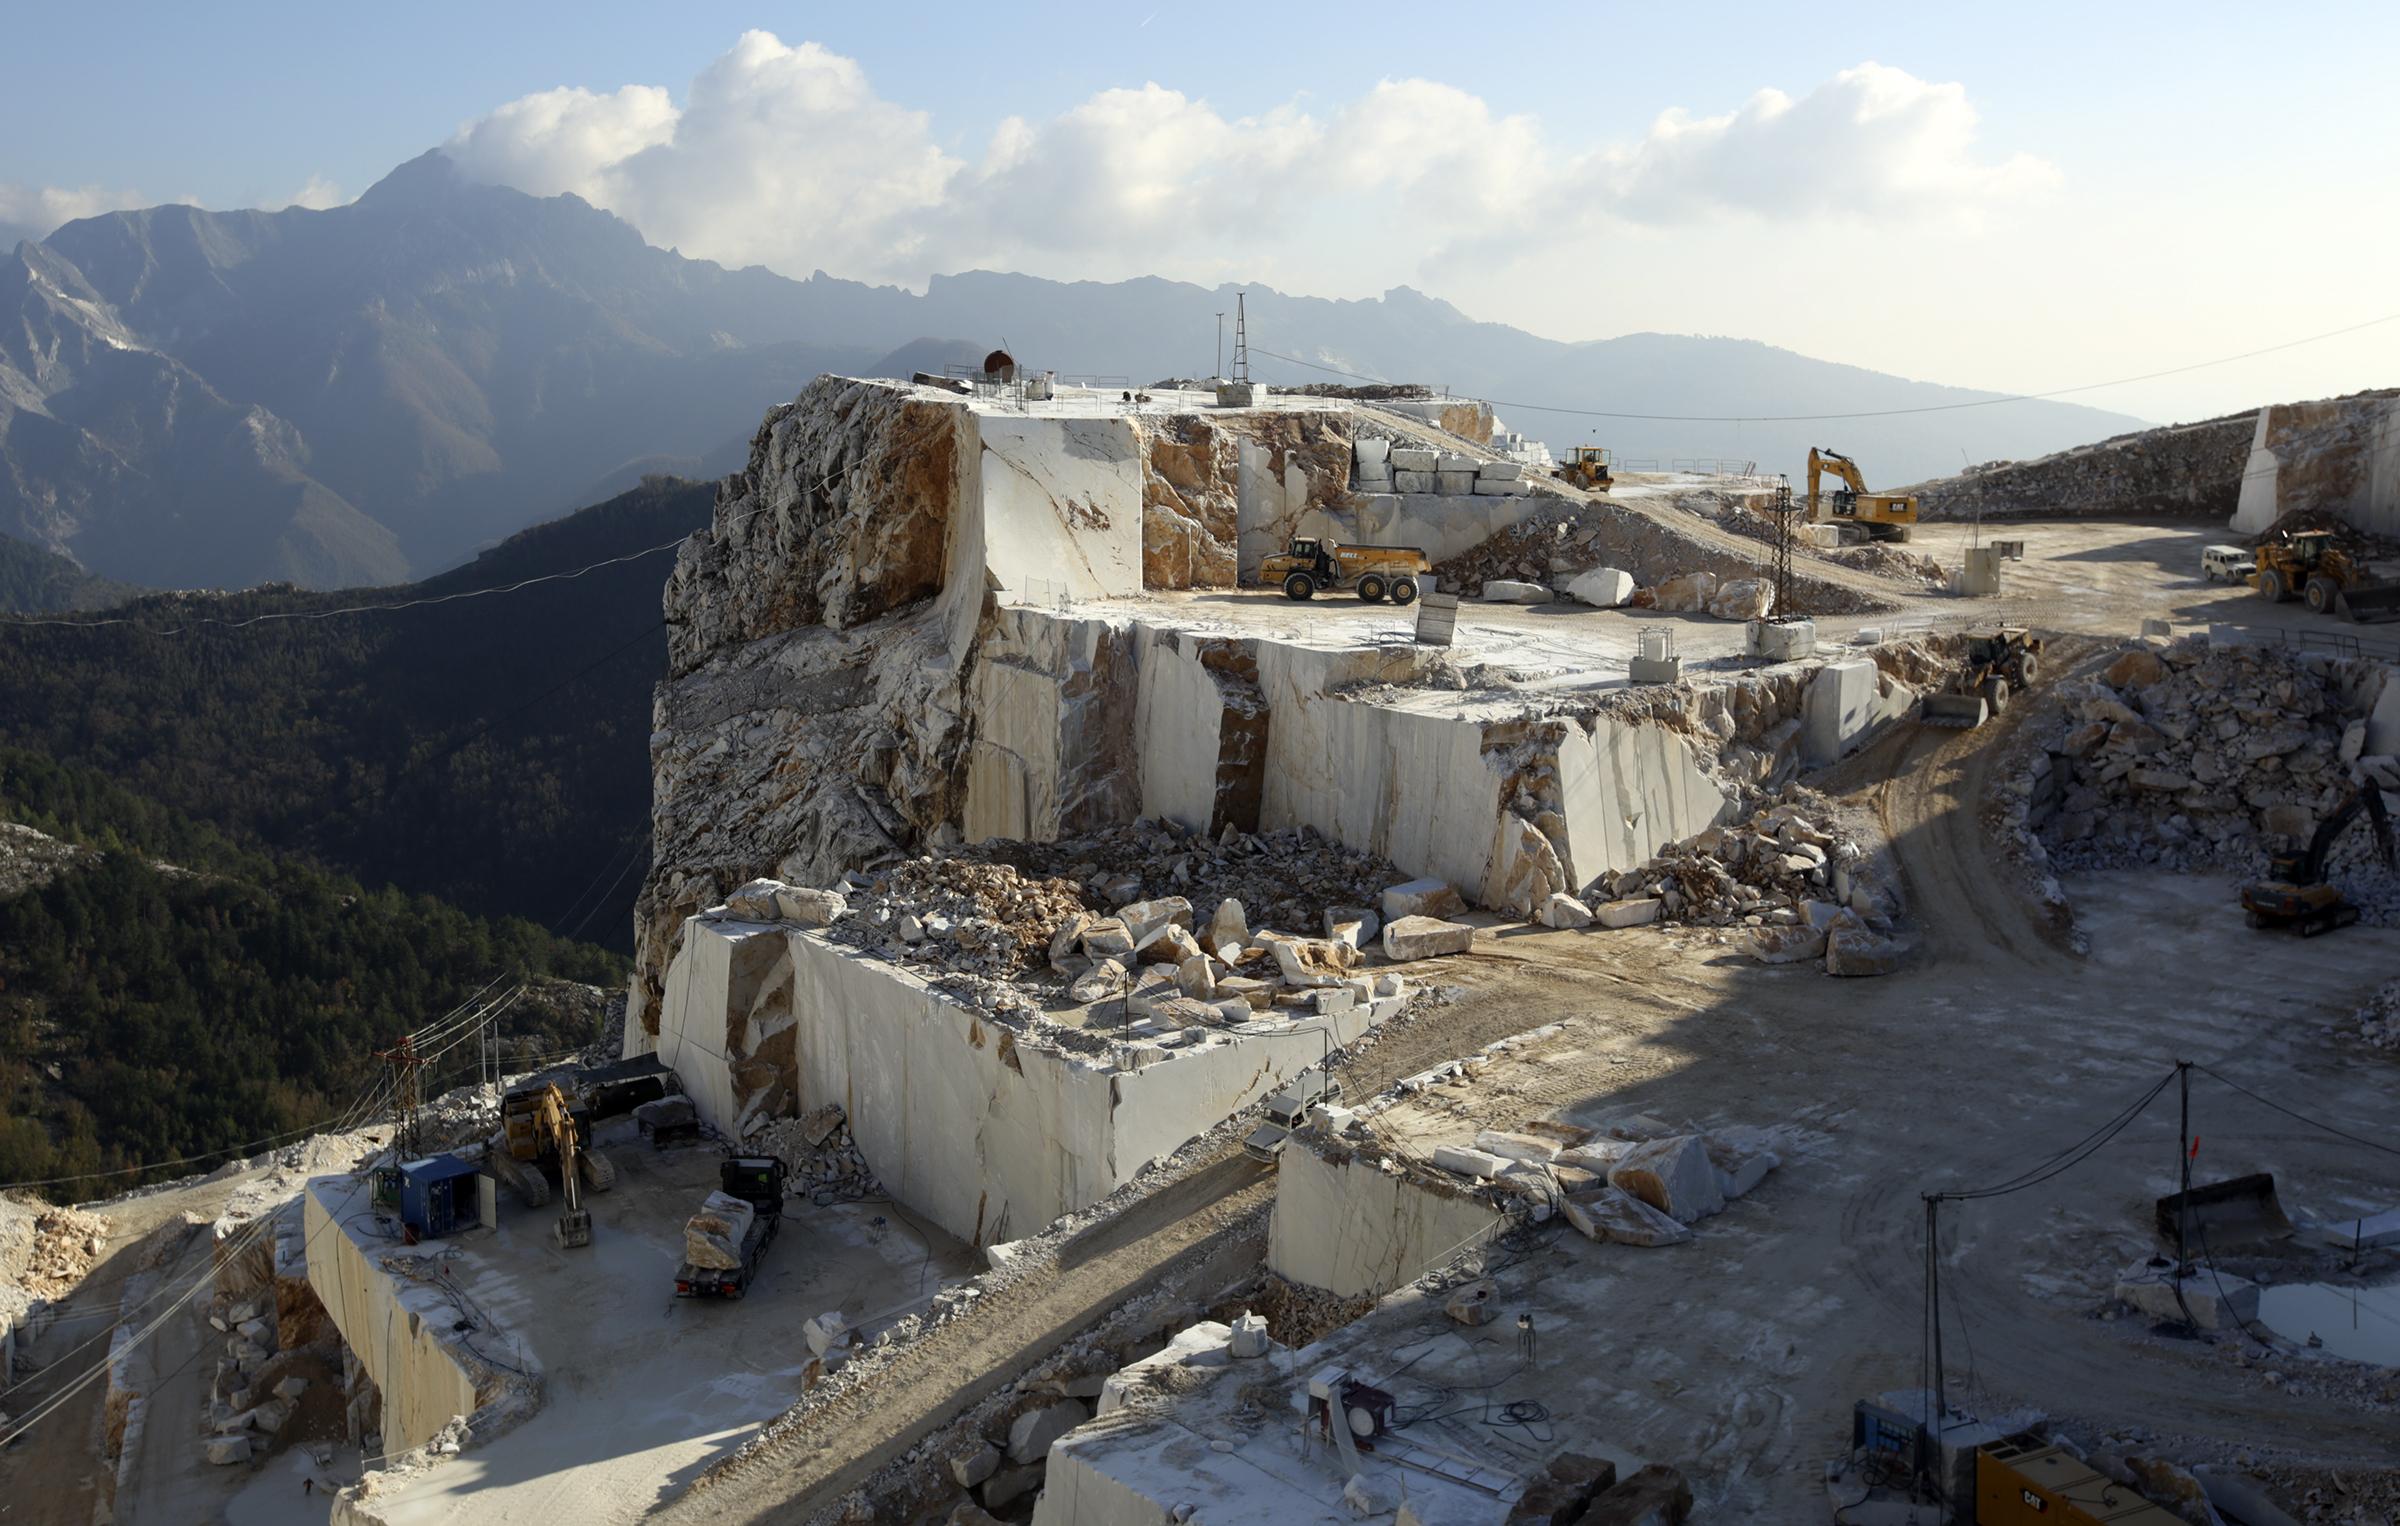 Trucks move marble blocks at a marble quarry in Carrara, Italy, on Thursday, Nov. 15, 2018.